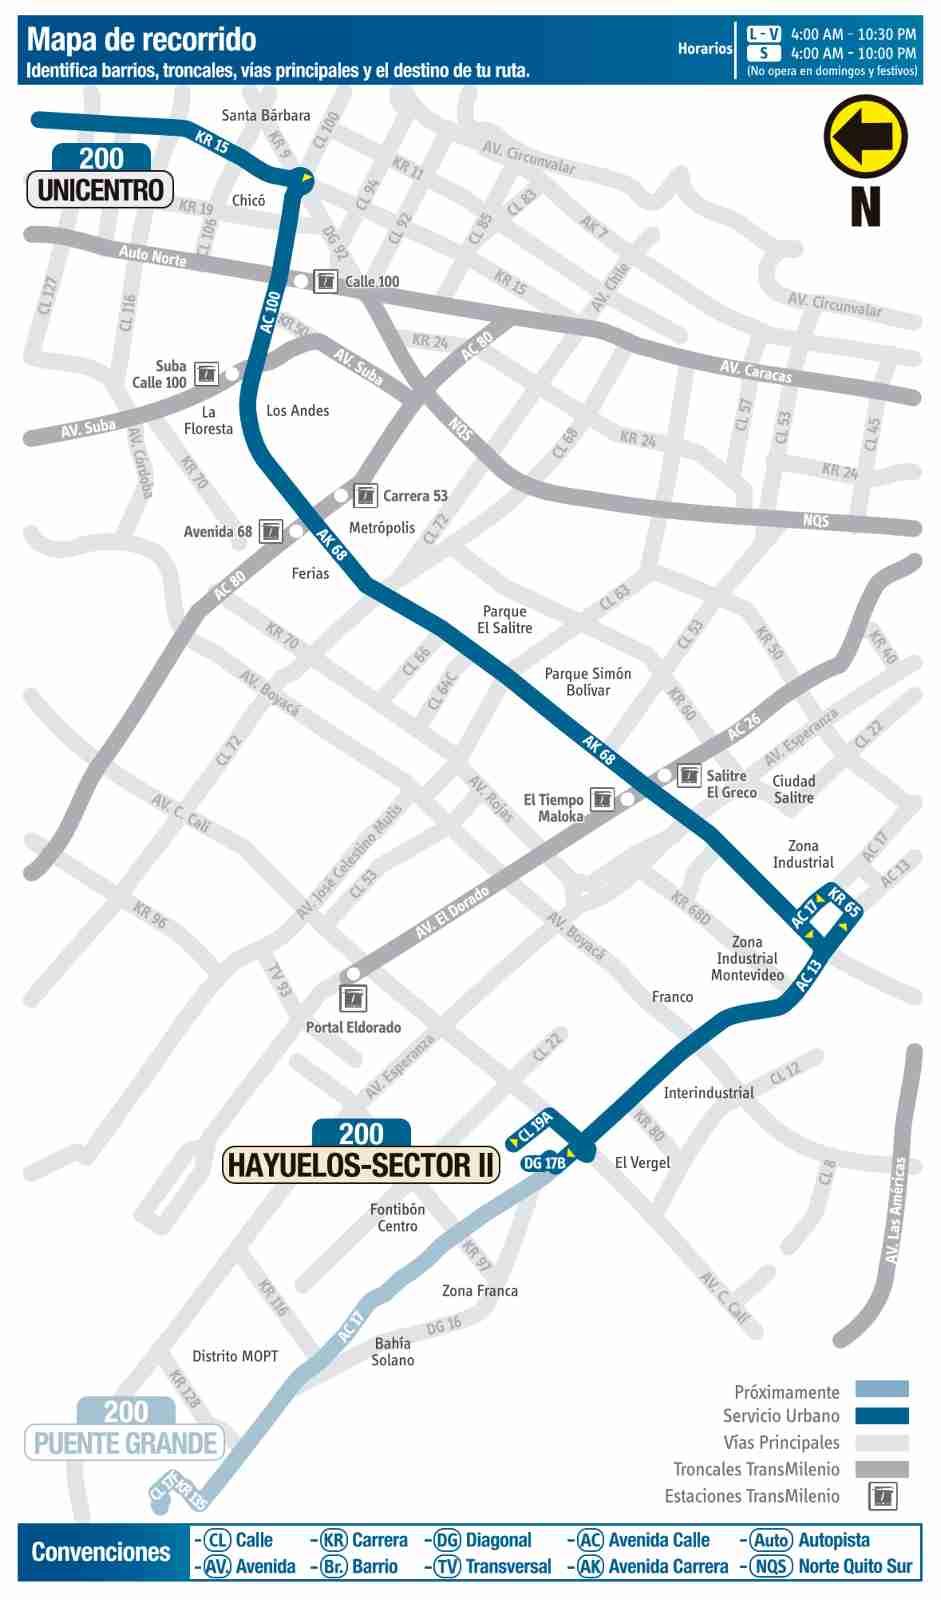 Ruta SITP: 200 Hayuelos Sector II - Unicentro (mapa)